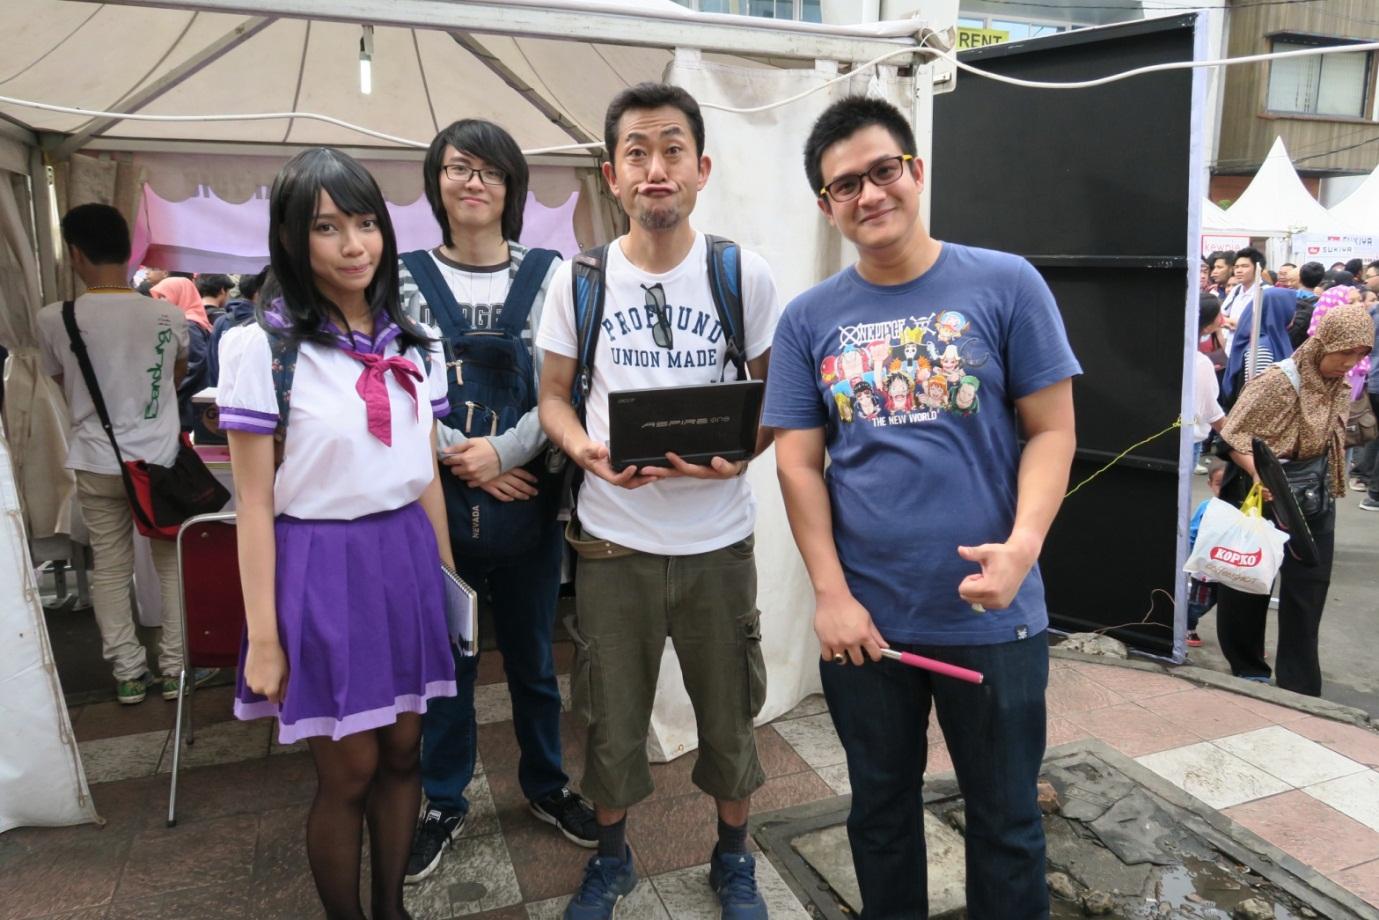 Seorang Reporter dari TV Jepang yang sengaja datang ke Indonesia untuk meliput festival Ennichisai telah selesai kami wawancara